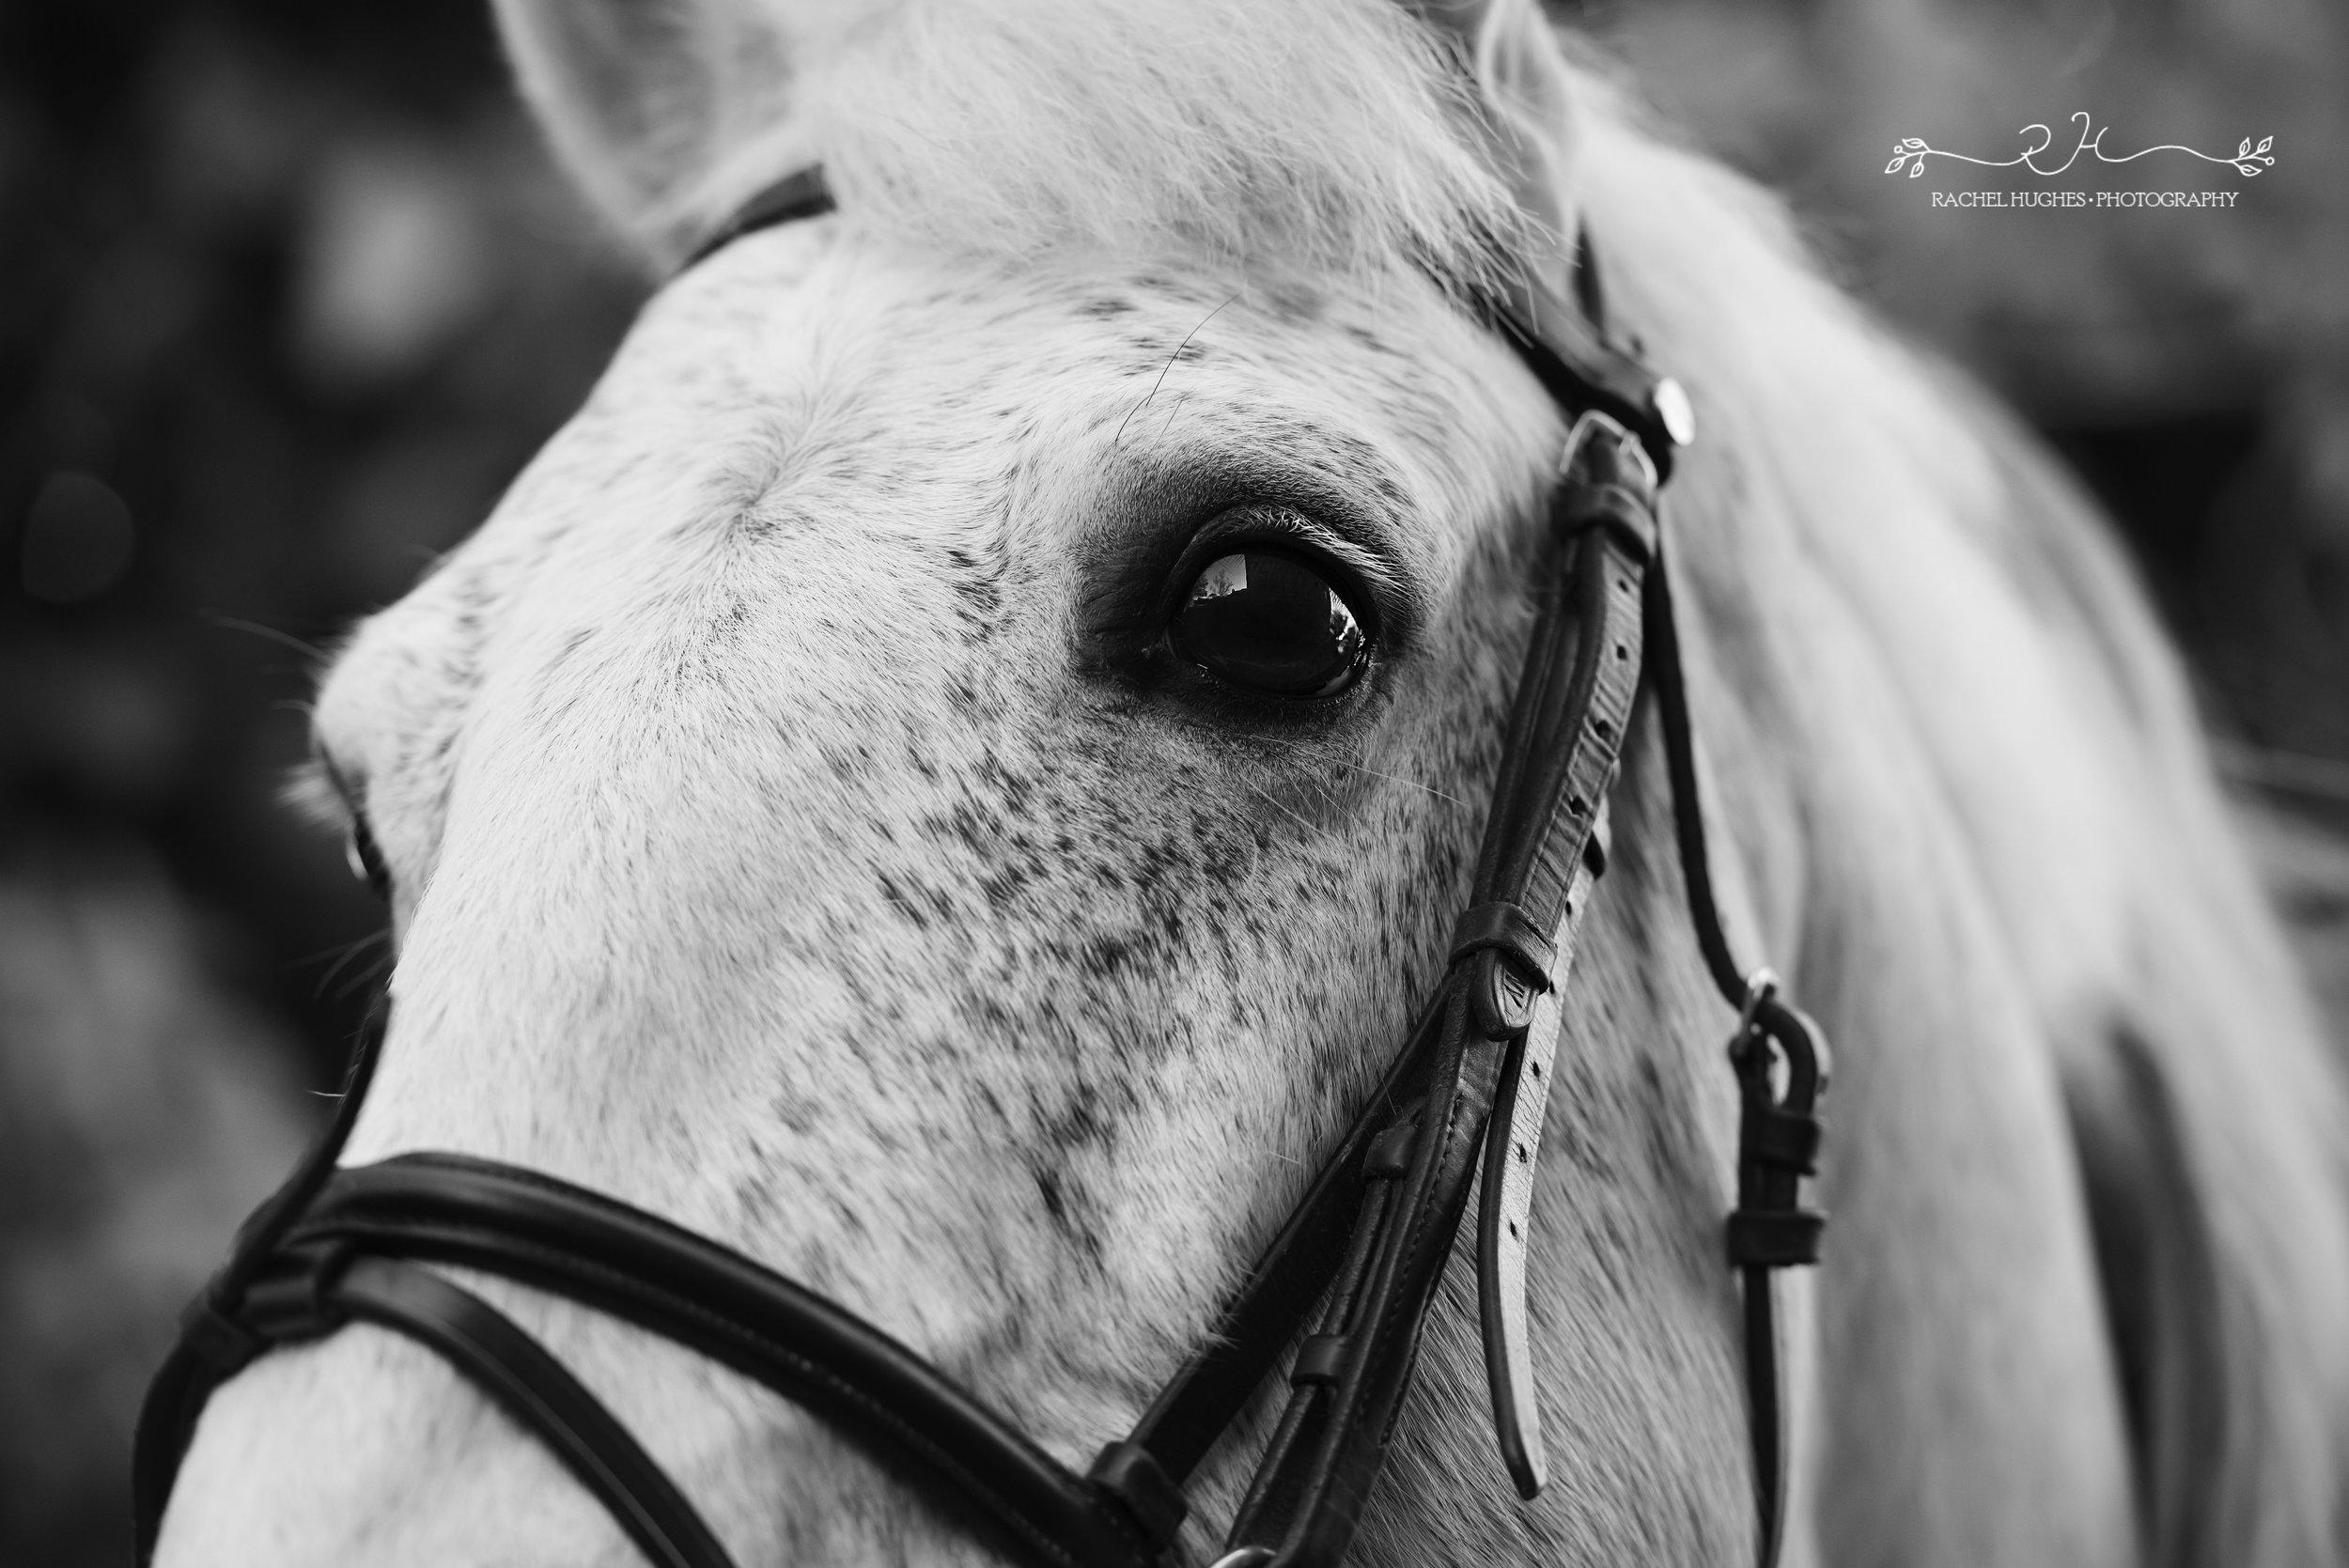 Jersey photographer - close up of horse eye